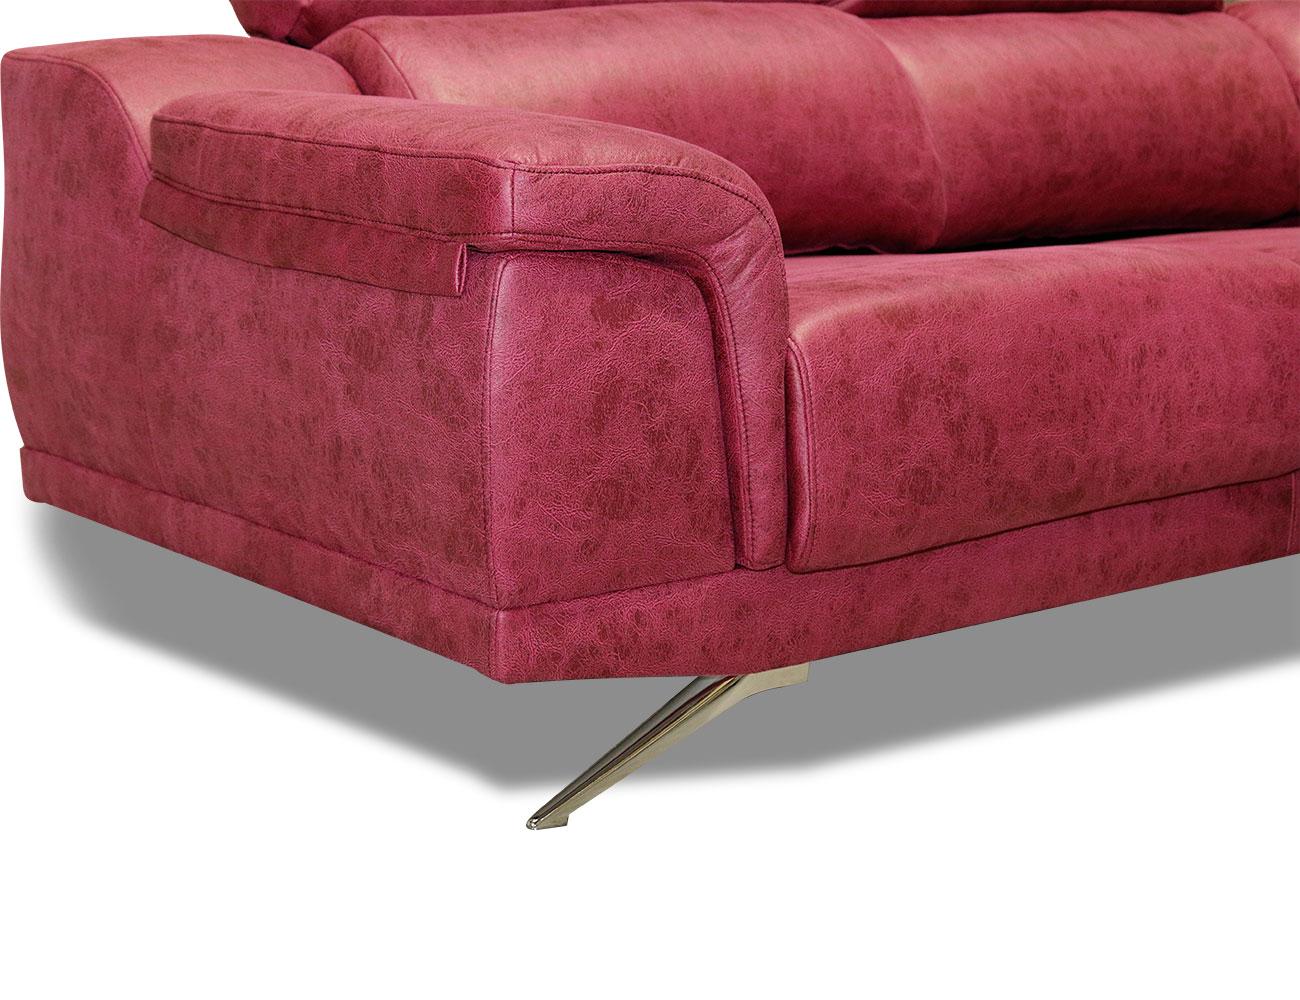 Sofa rinconera tejido antimanchas fucsia rosa 3